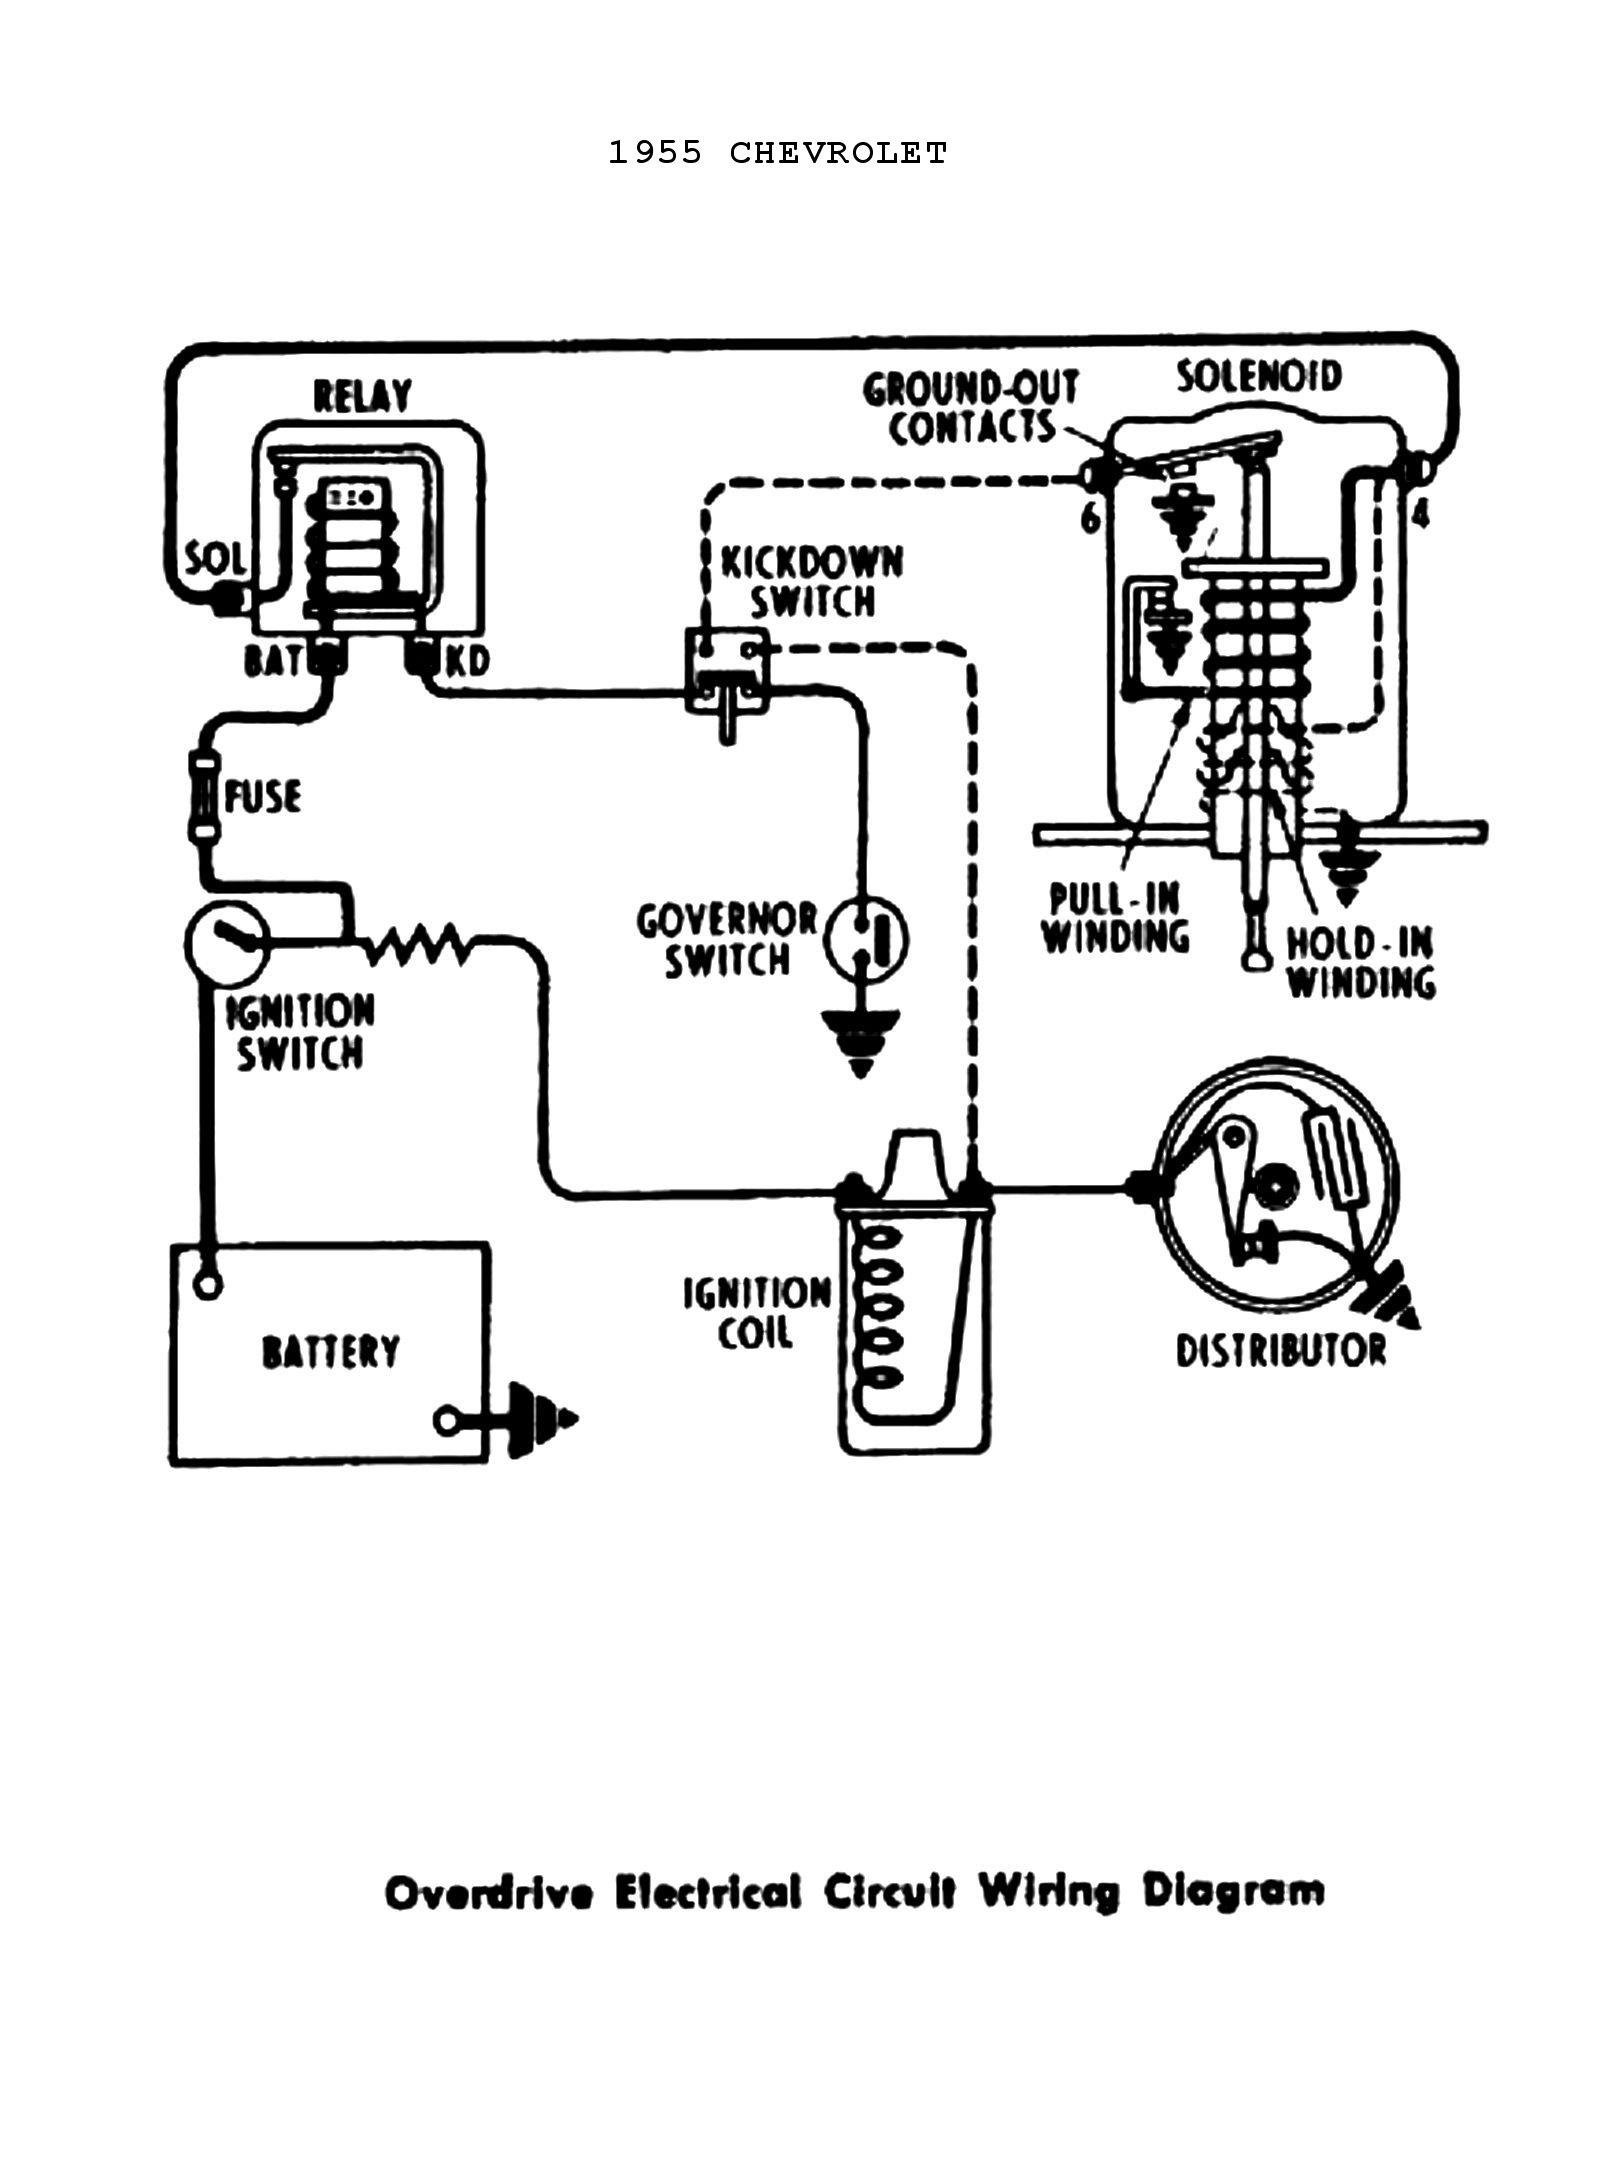 12v Ignition Wiring Diagram Manual E Books